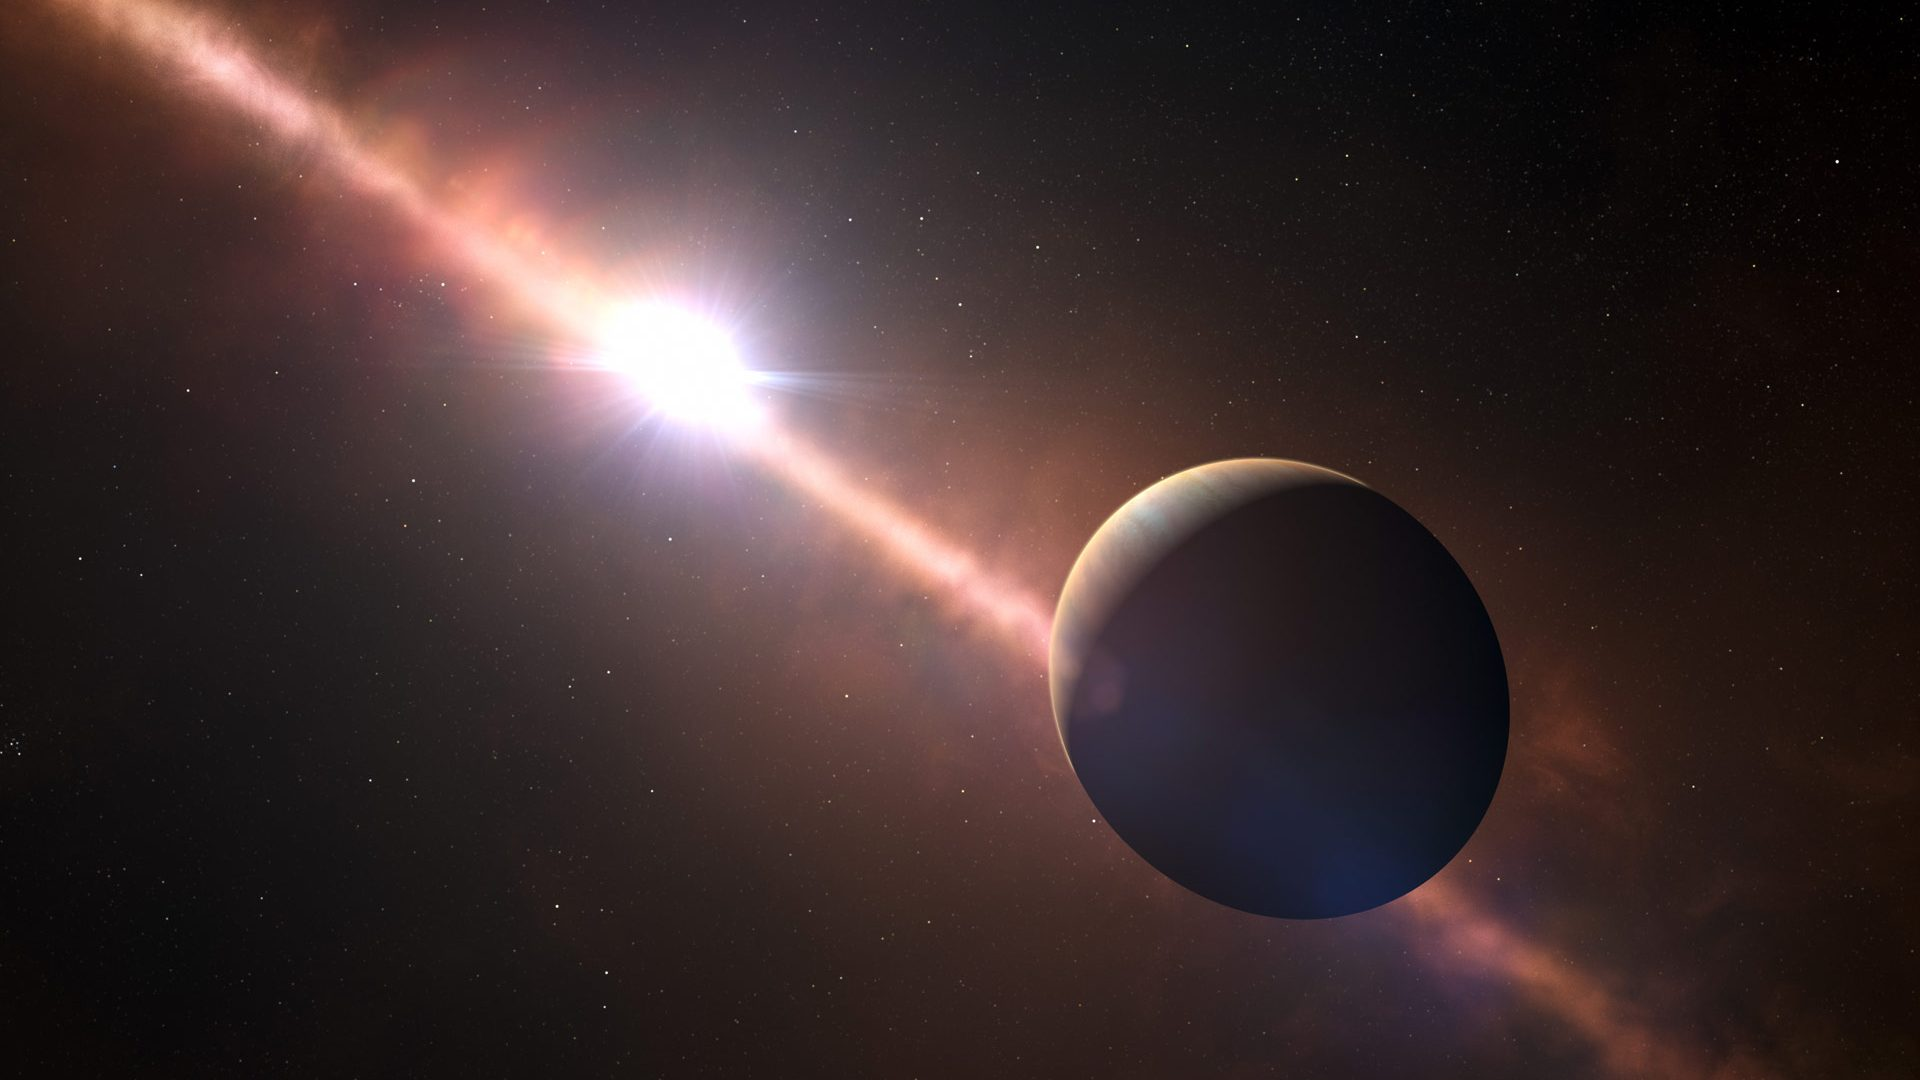 Comet Orbits Hint At New Planet, Scientist Says